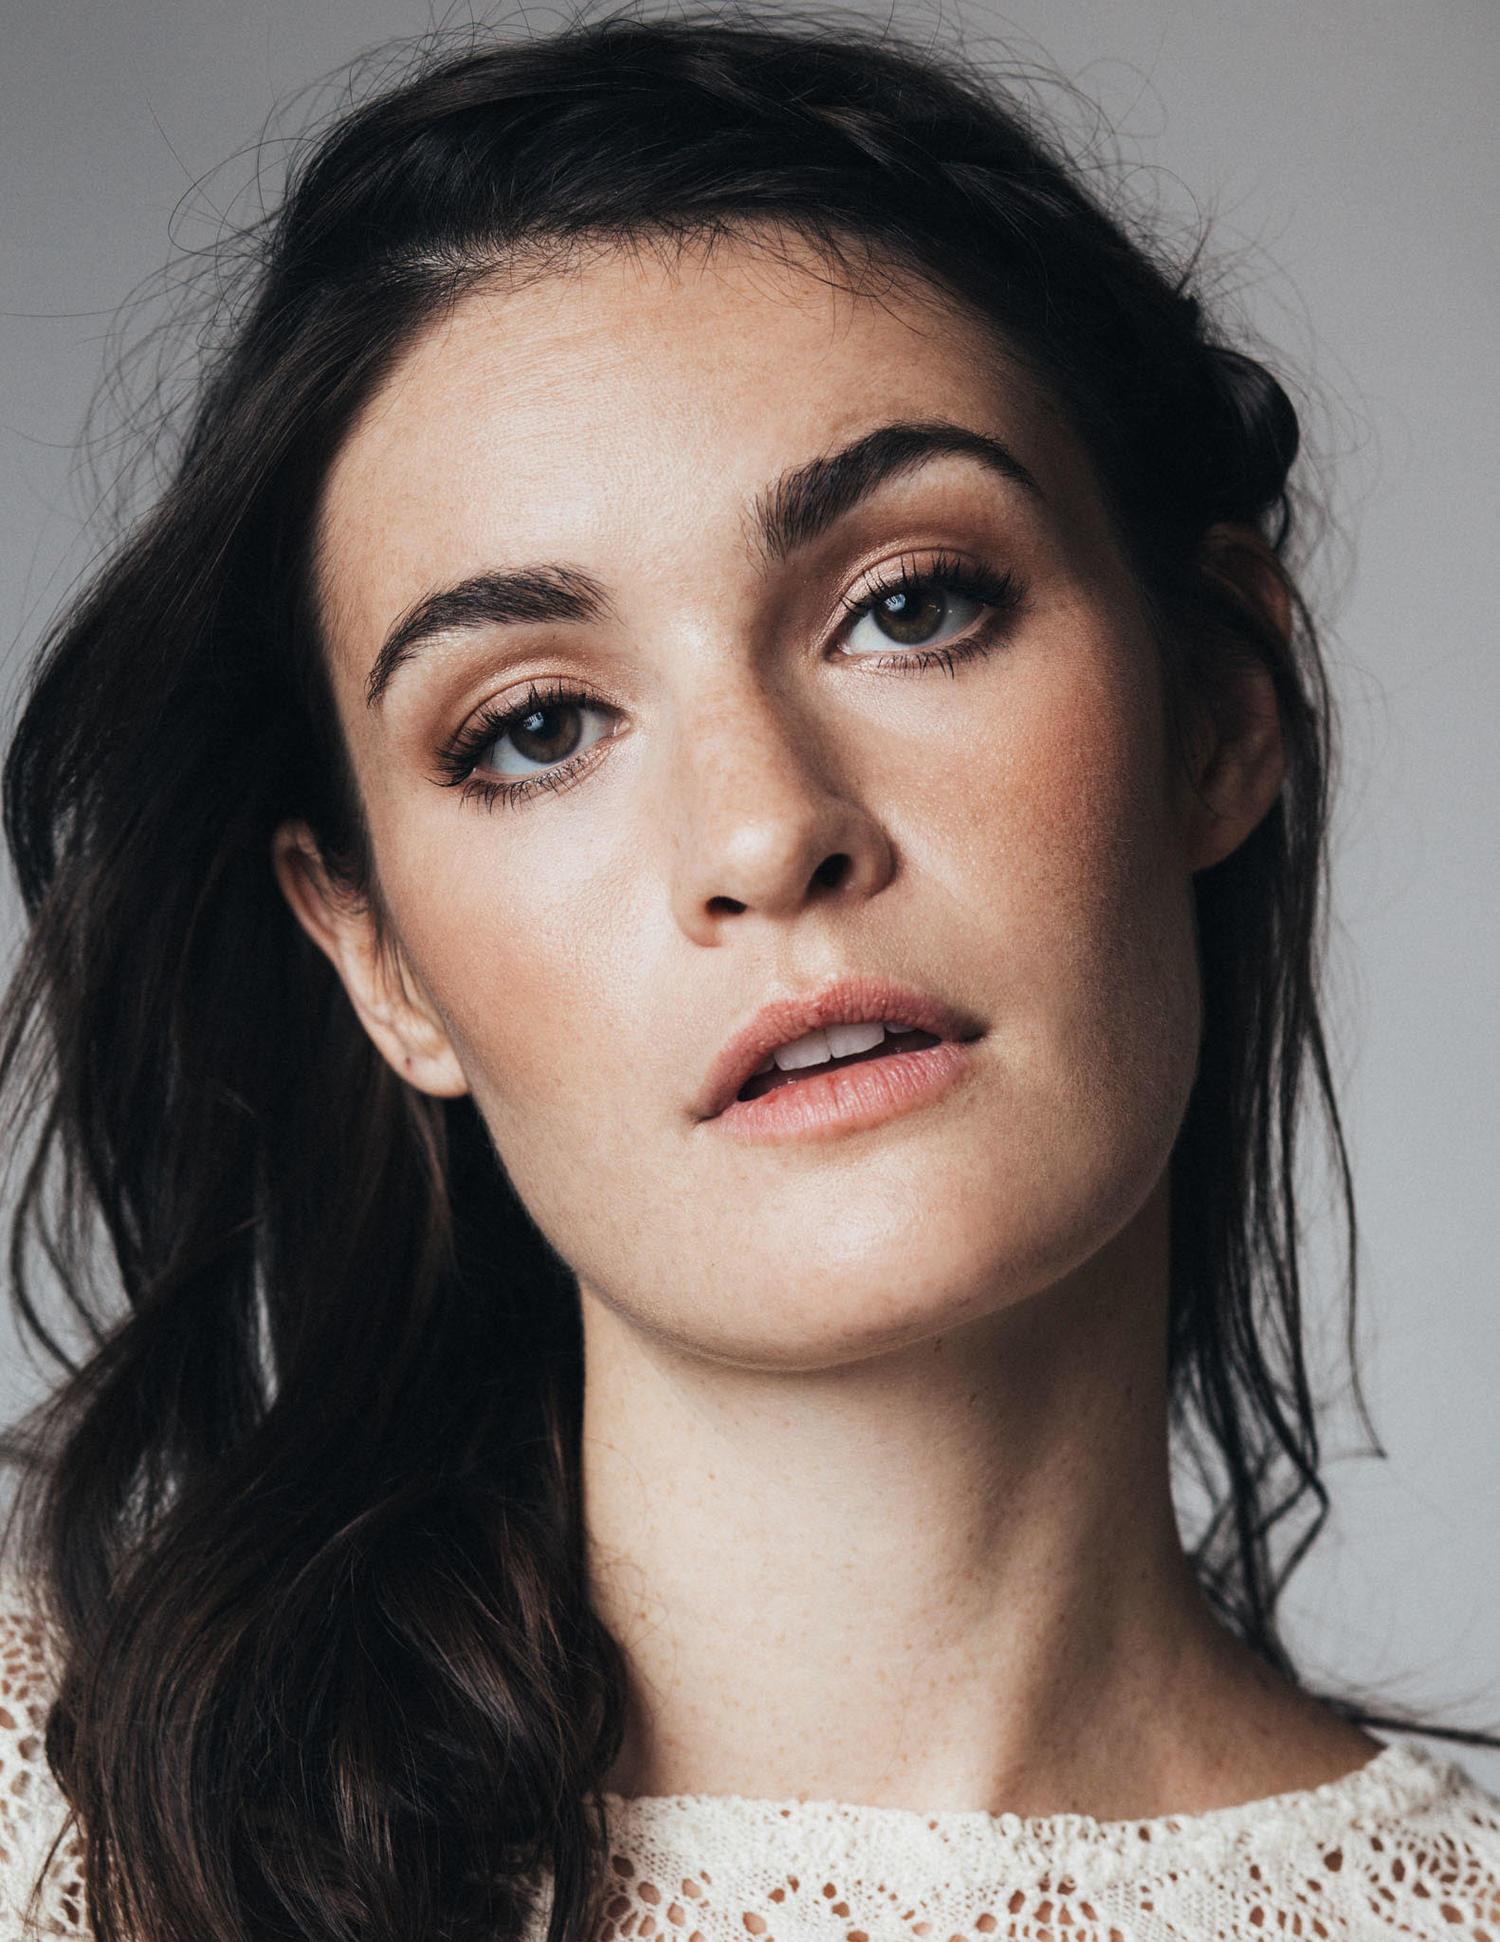 makeup-by-Mariana-Bull-08.jpg